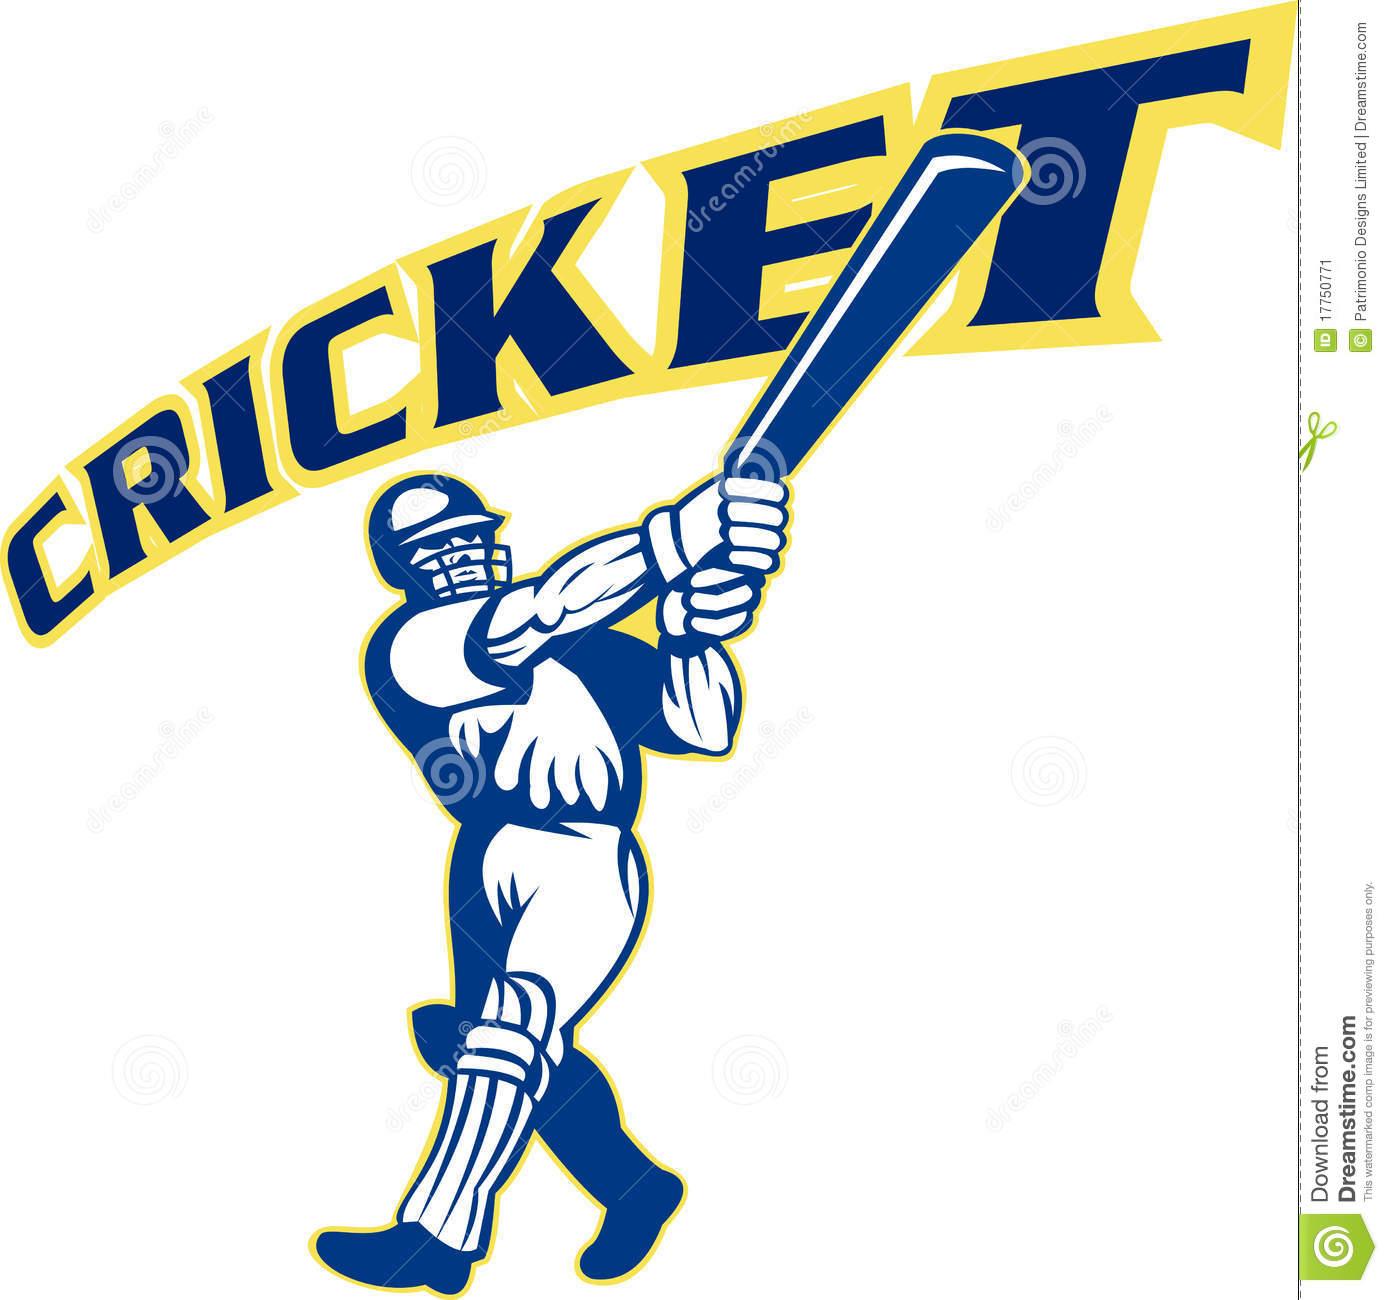 Cricket Player Batsman Batting Retro Stock Illustrations.